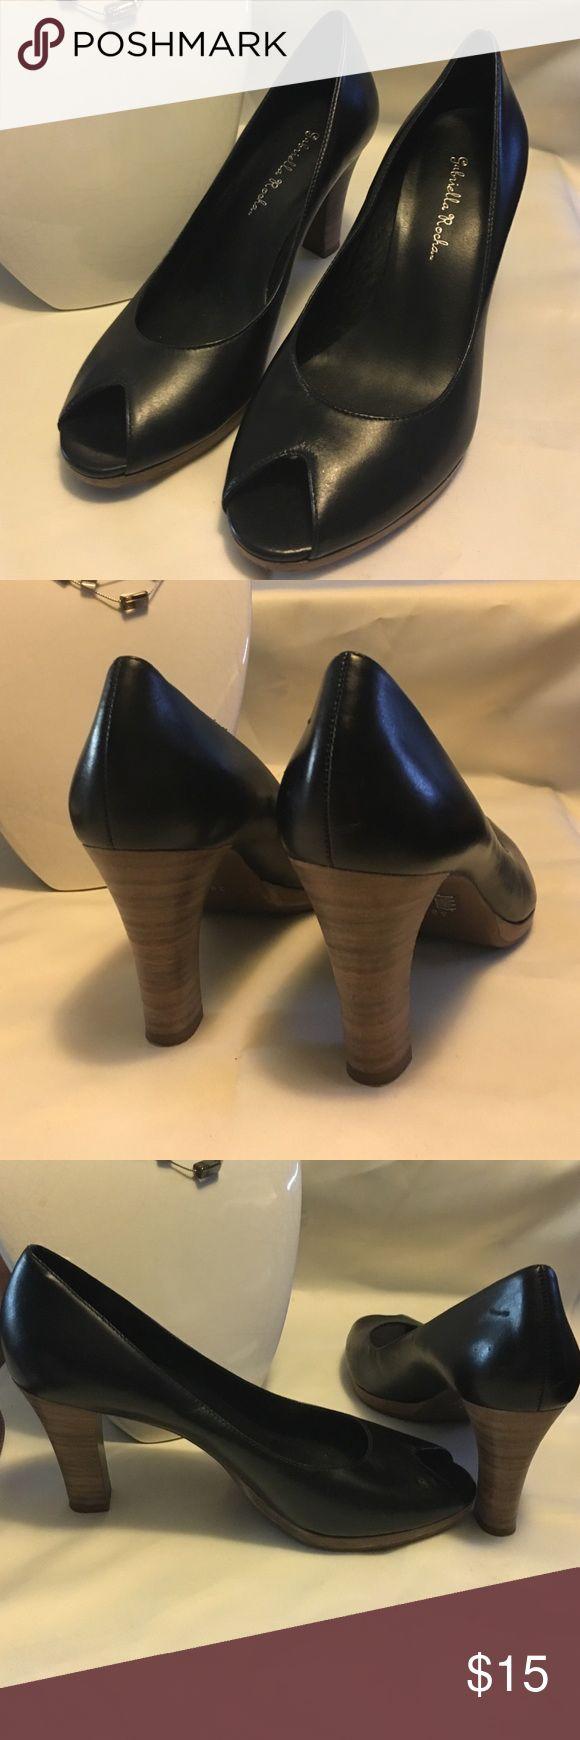 Gabriella Rocha Heels Gabriella Rocha heels, size 38. Used condition Gabriella Rocha Shoes Heels